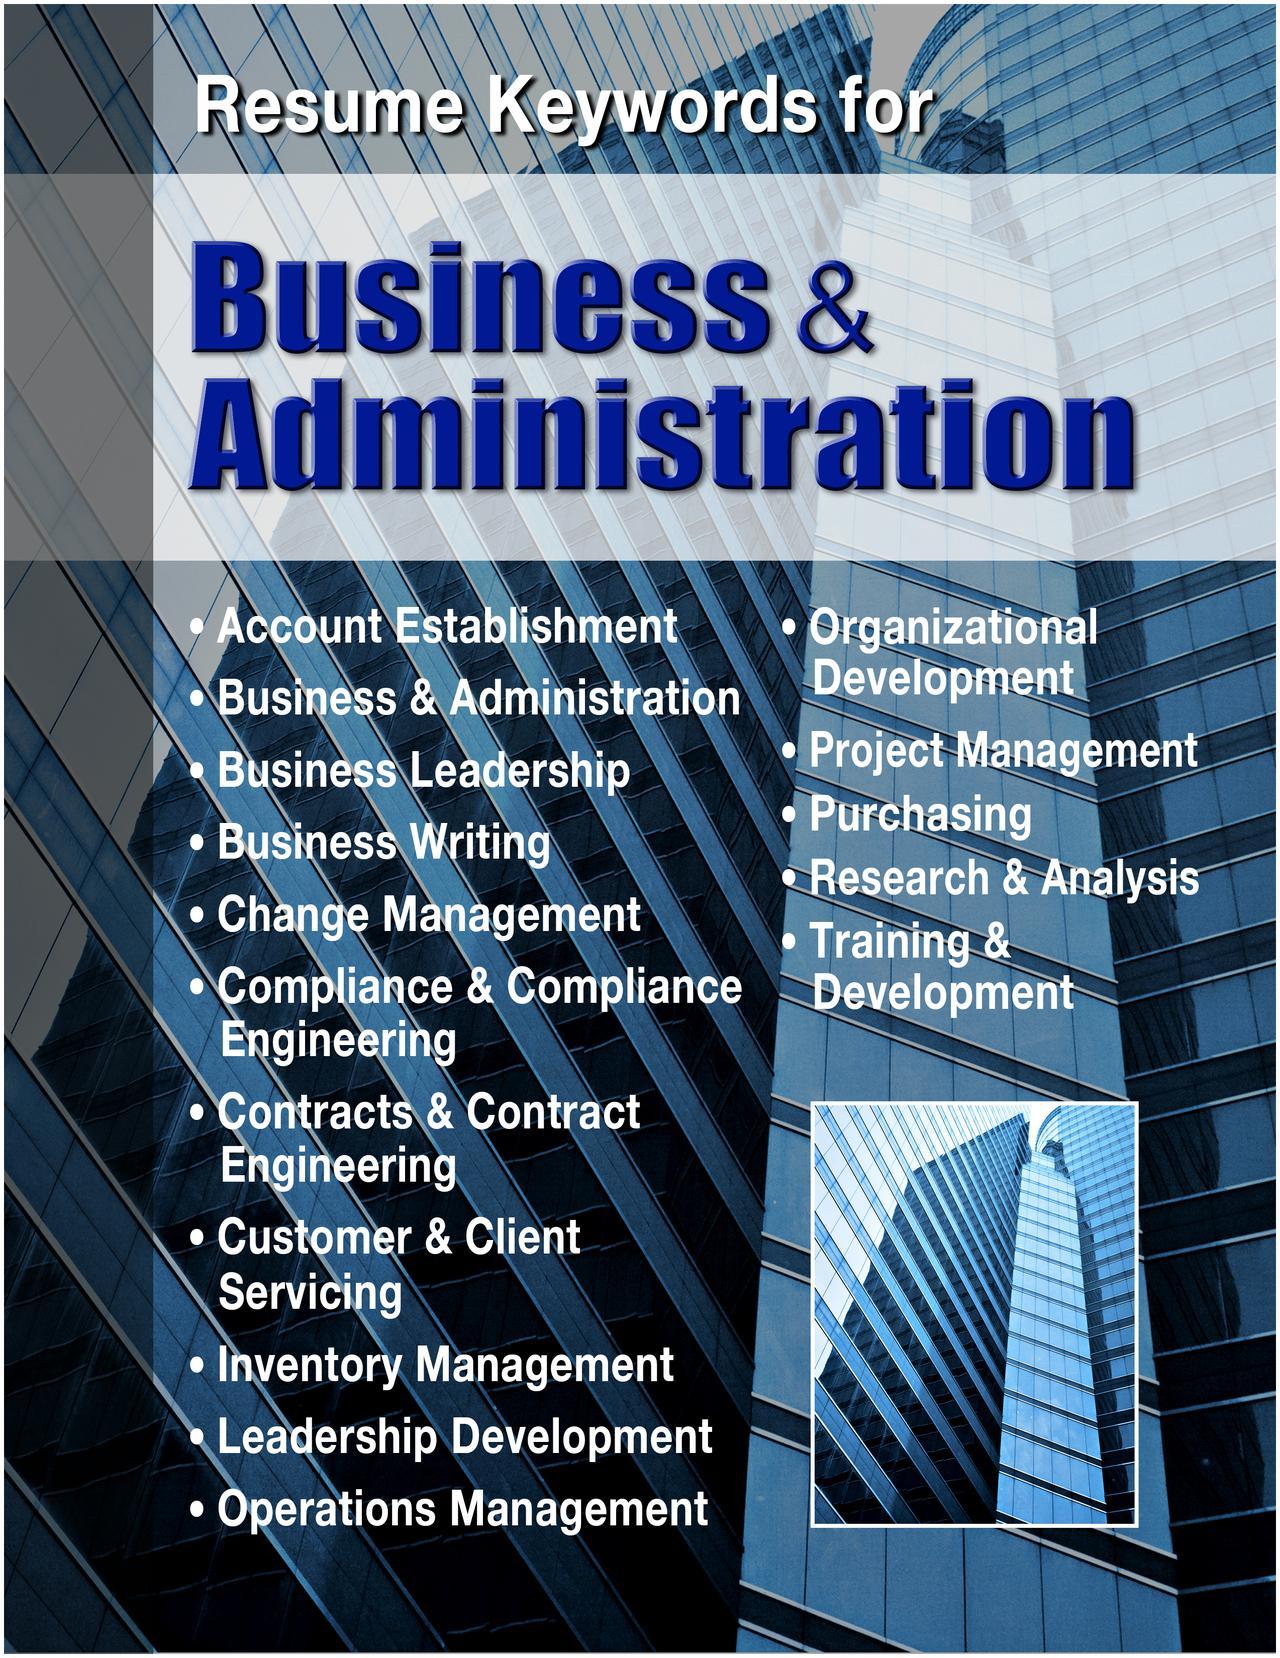 business & administration divider.jpg